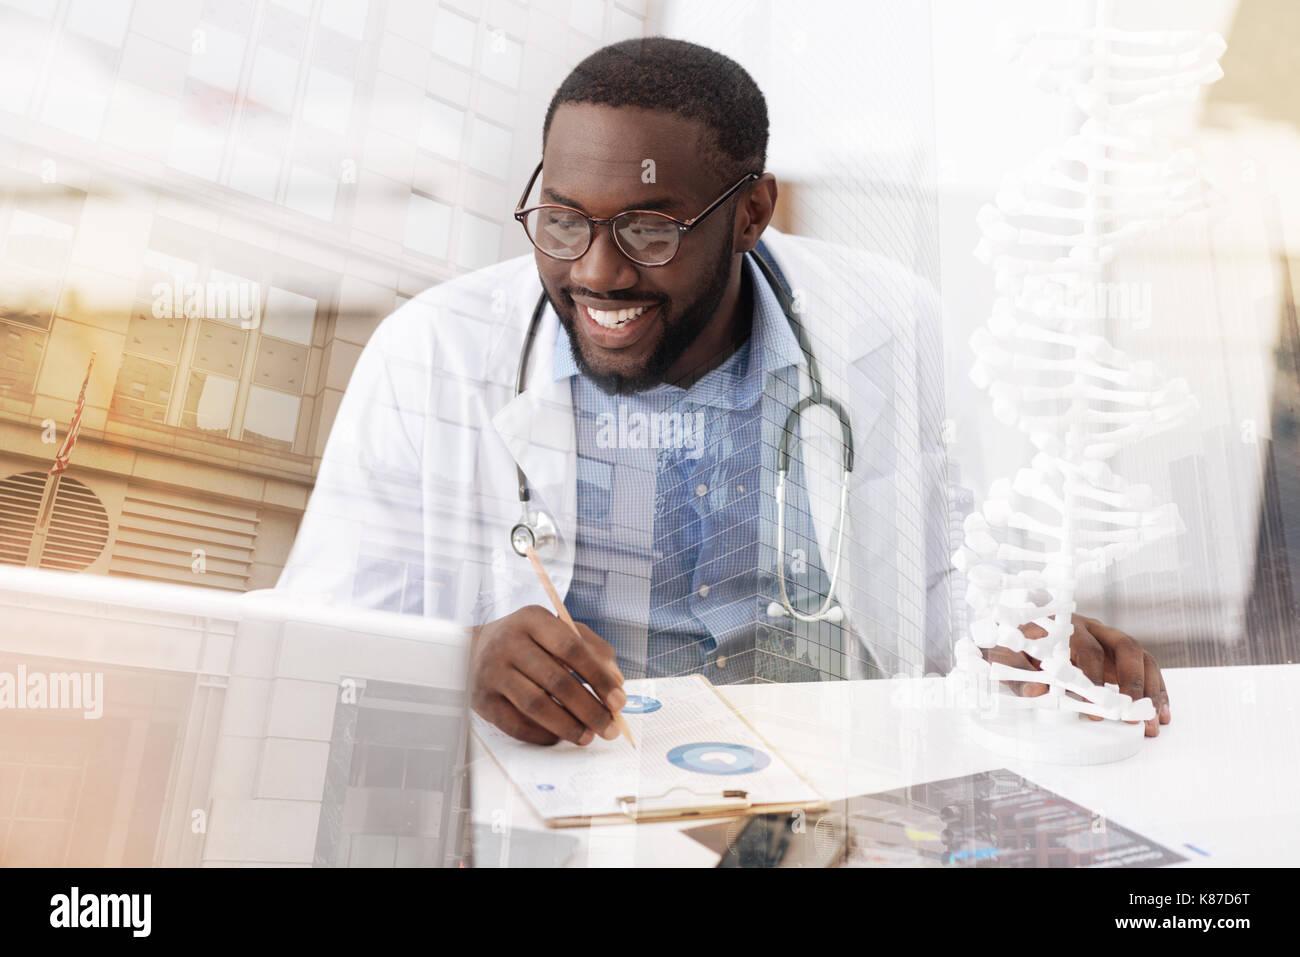 Encantado doctor trabaja con notas Imagen De Stock